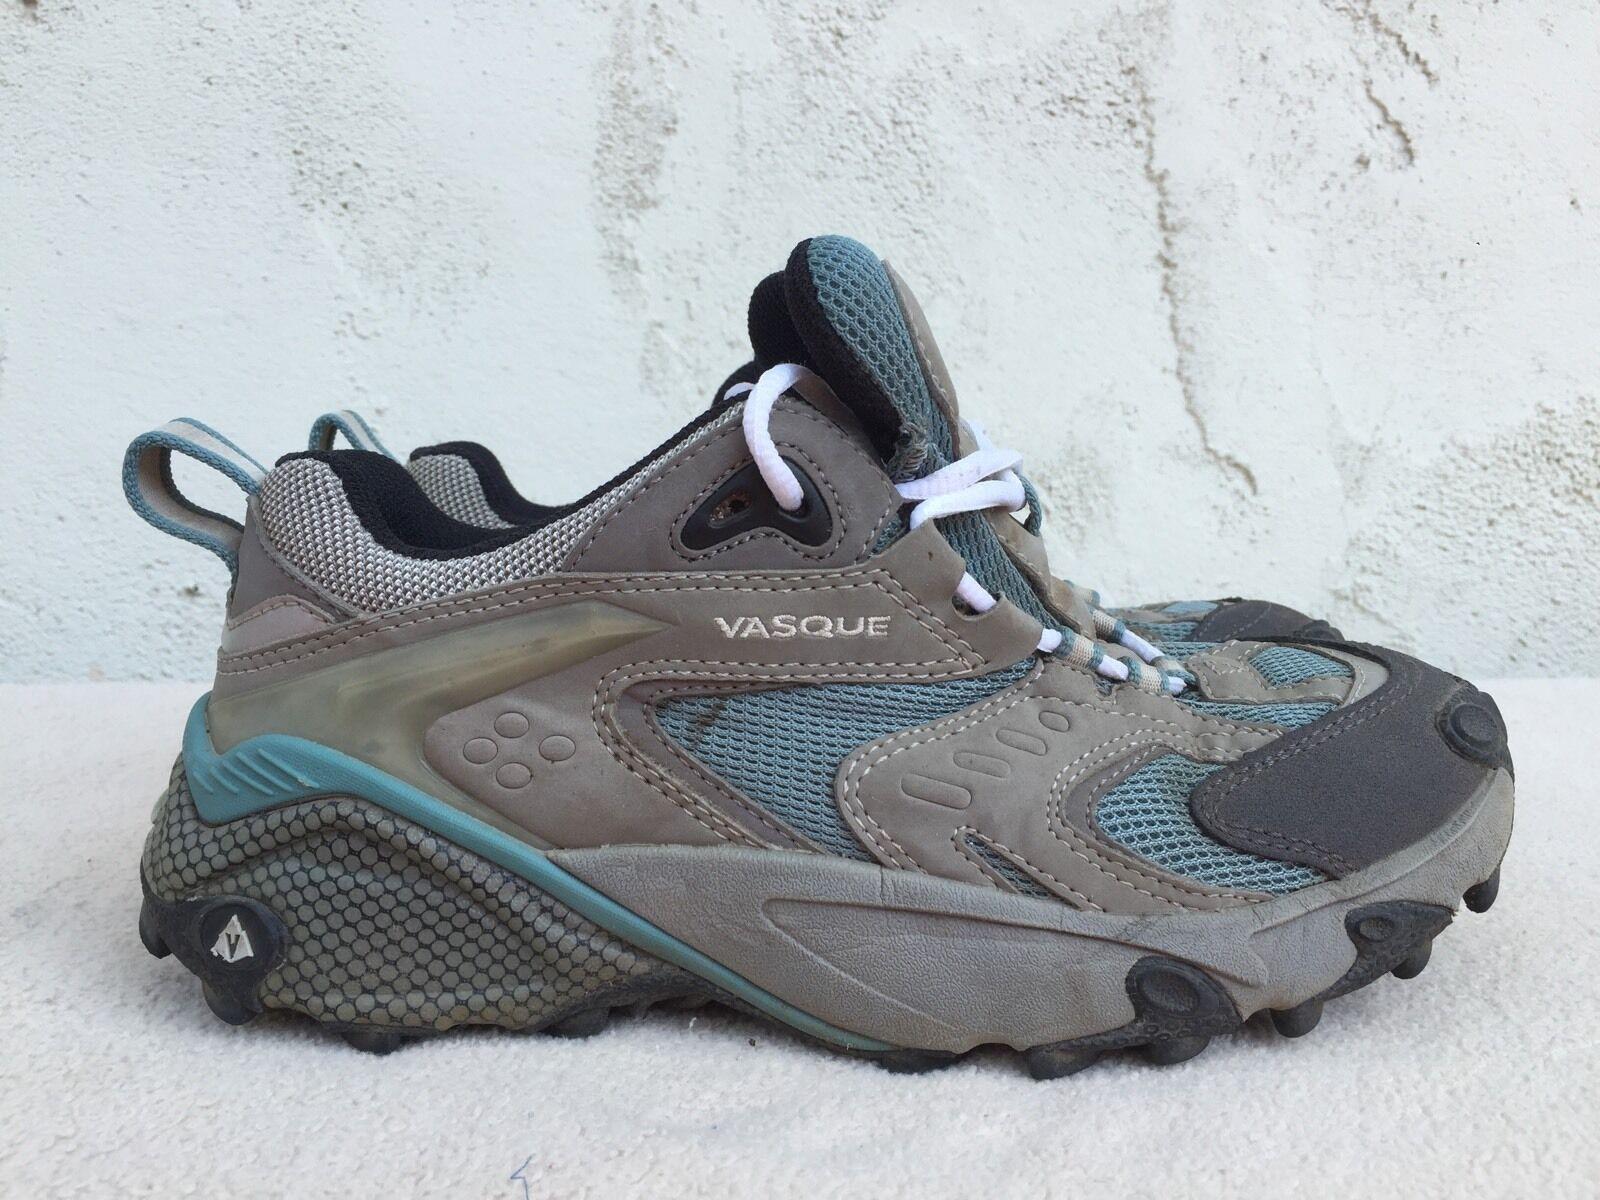 EUC Vasque Womens Trail shoes Sneaker Boot Running Hiking US 8.5 M